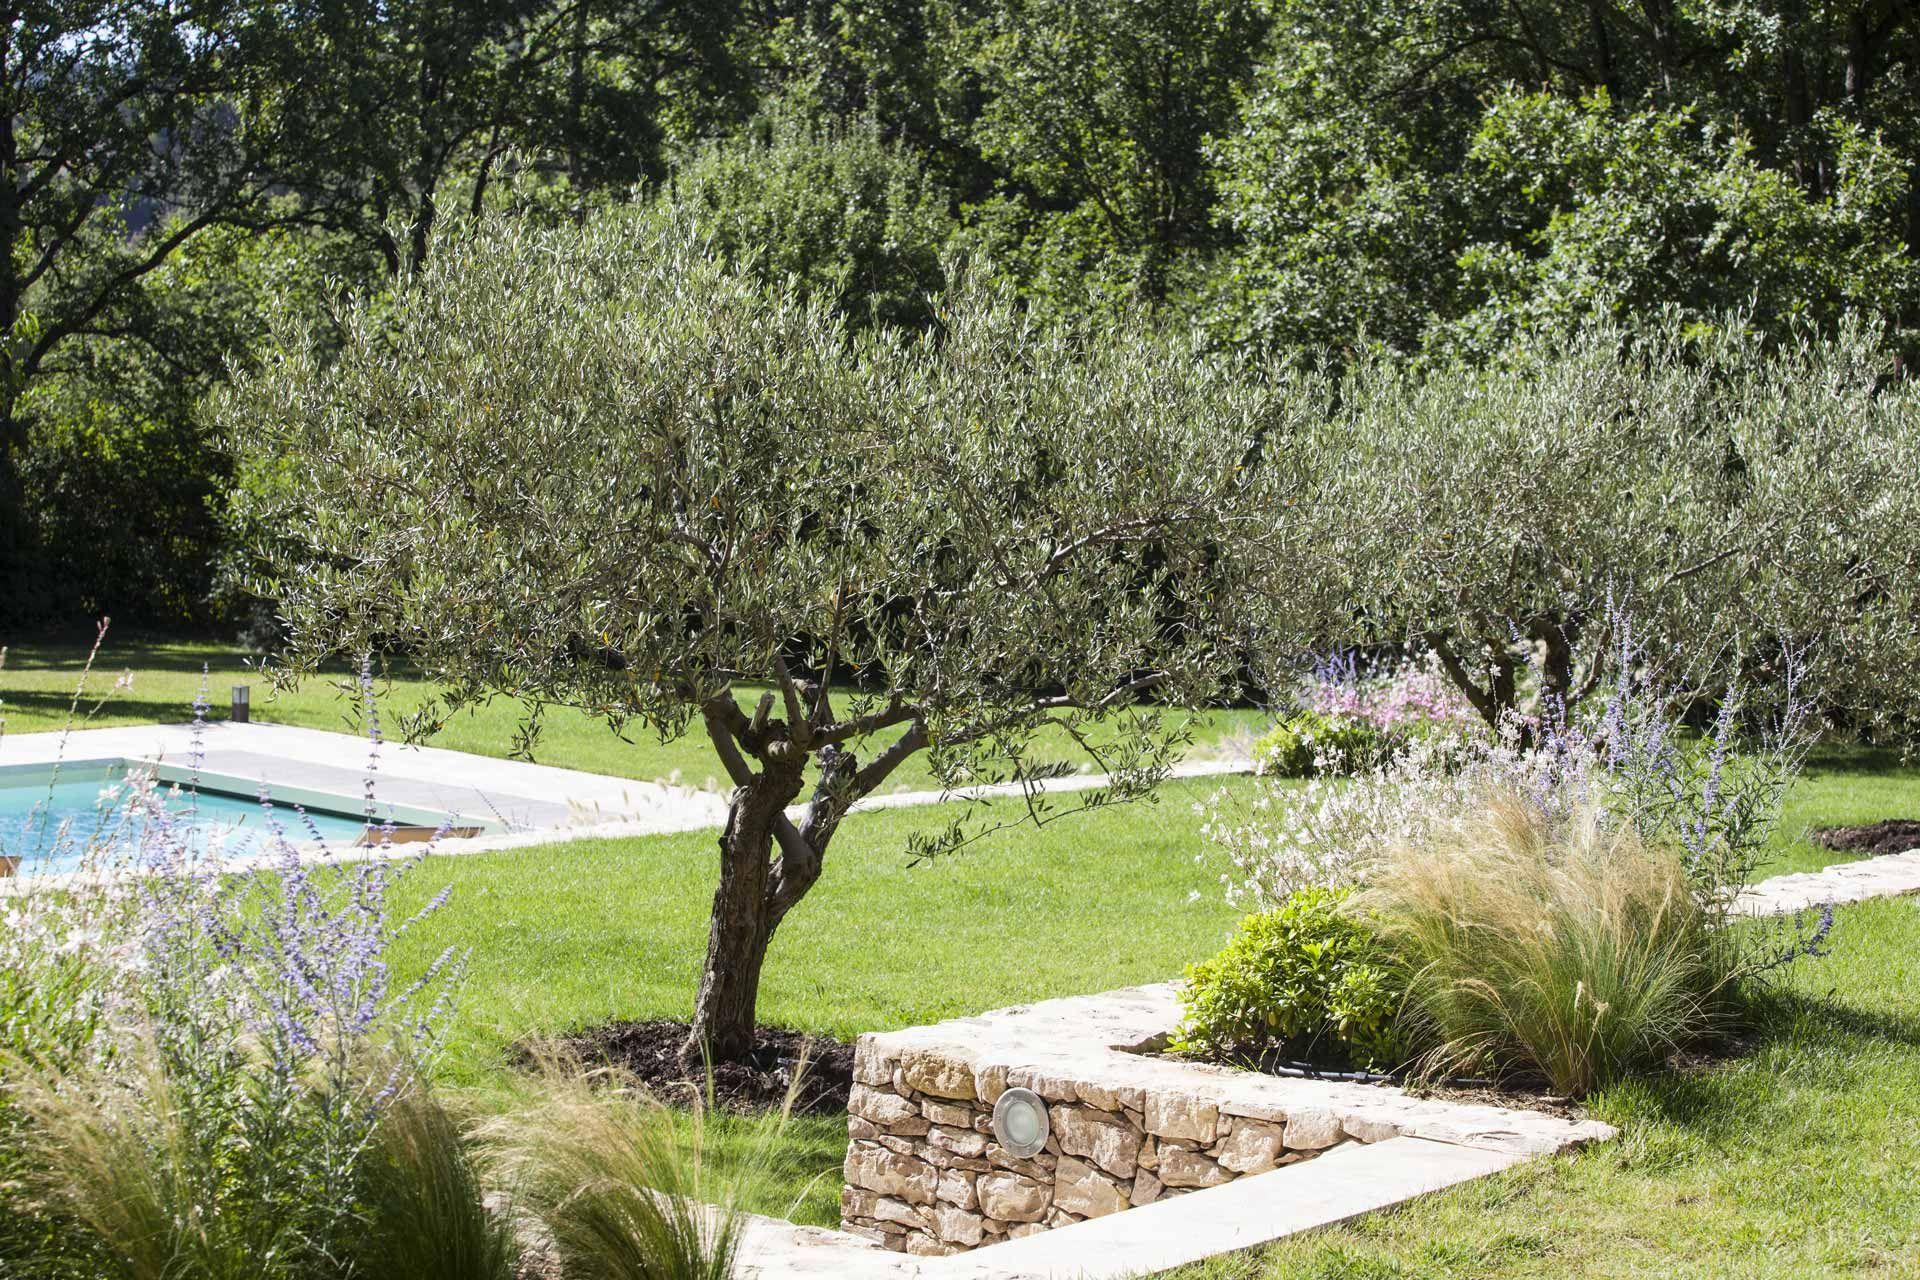 Jeu De Restanques Piscine Amenagement Paysager Terrasse Jardin